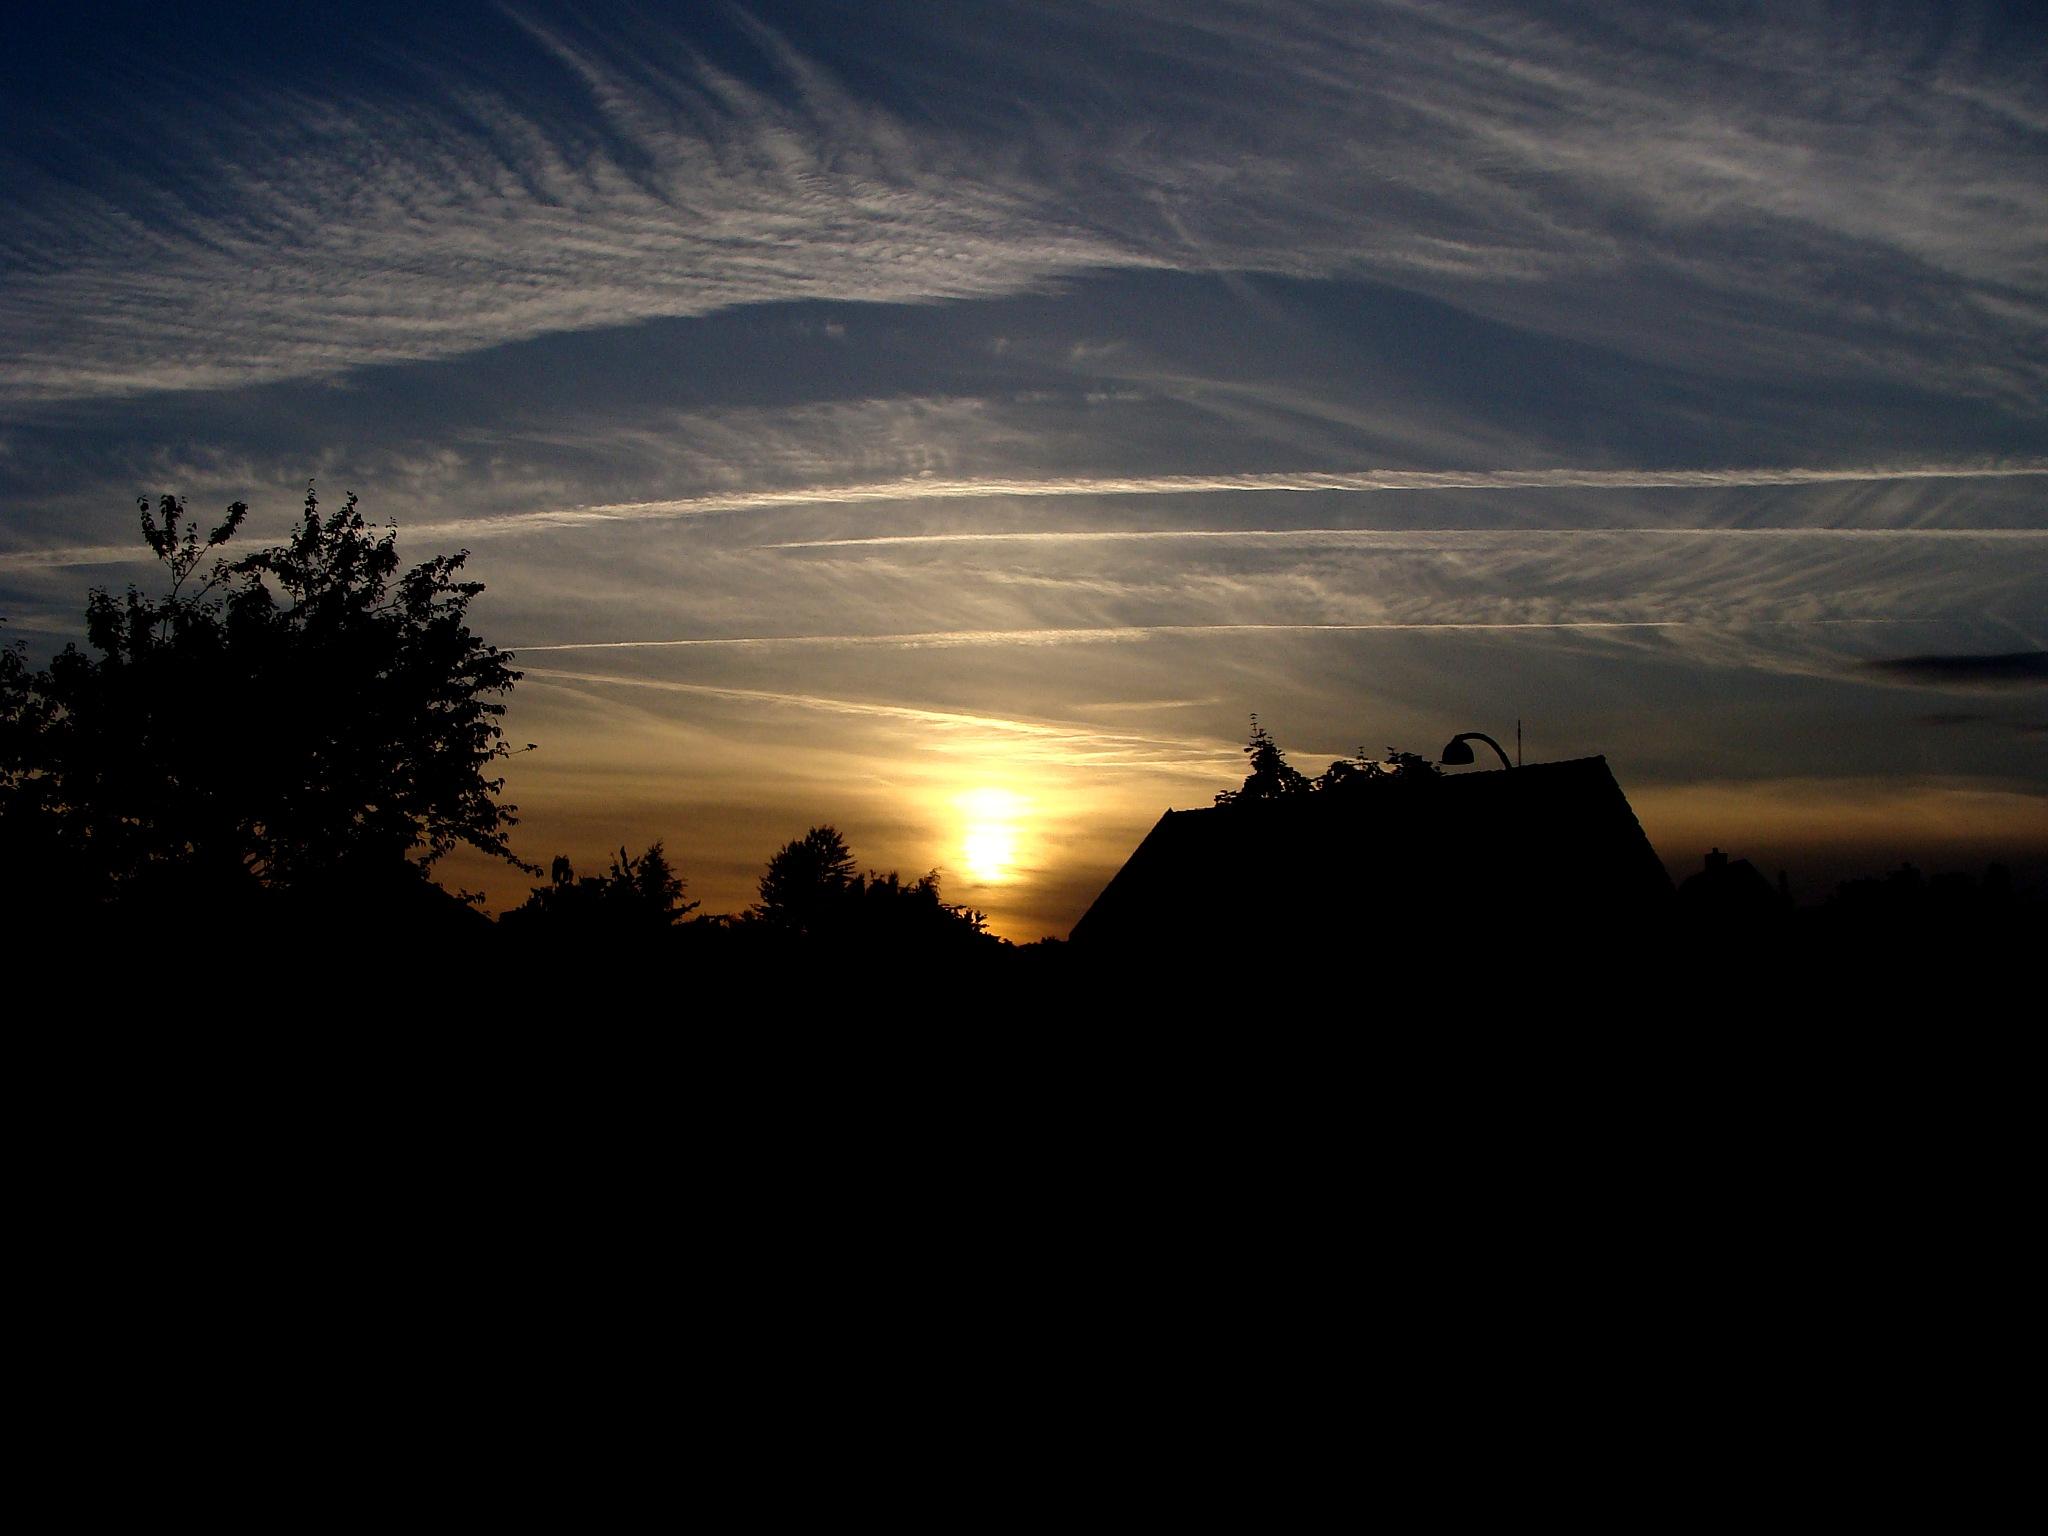 sunset 2 by Terry Dunn